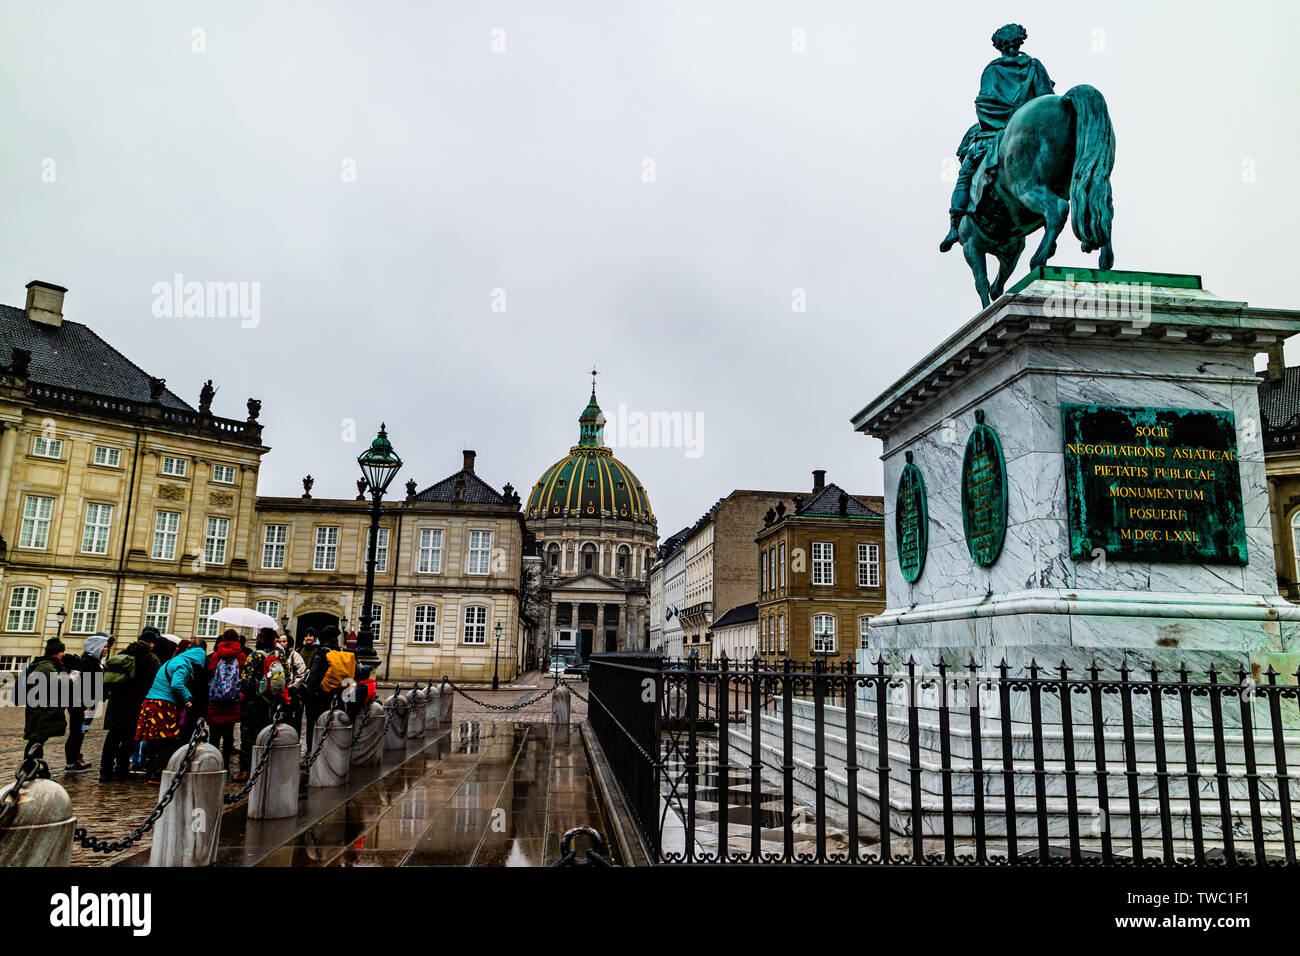 A walking tour group visit Amalienborg Palace, the royal residence in Copenhagen, Denmark. January 2019. Stock Photo